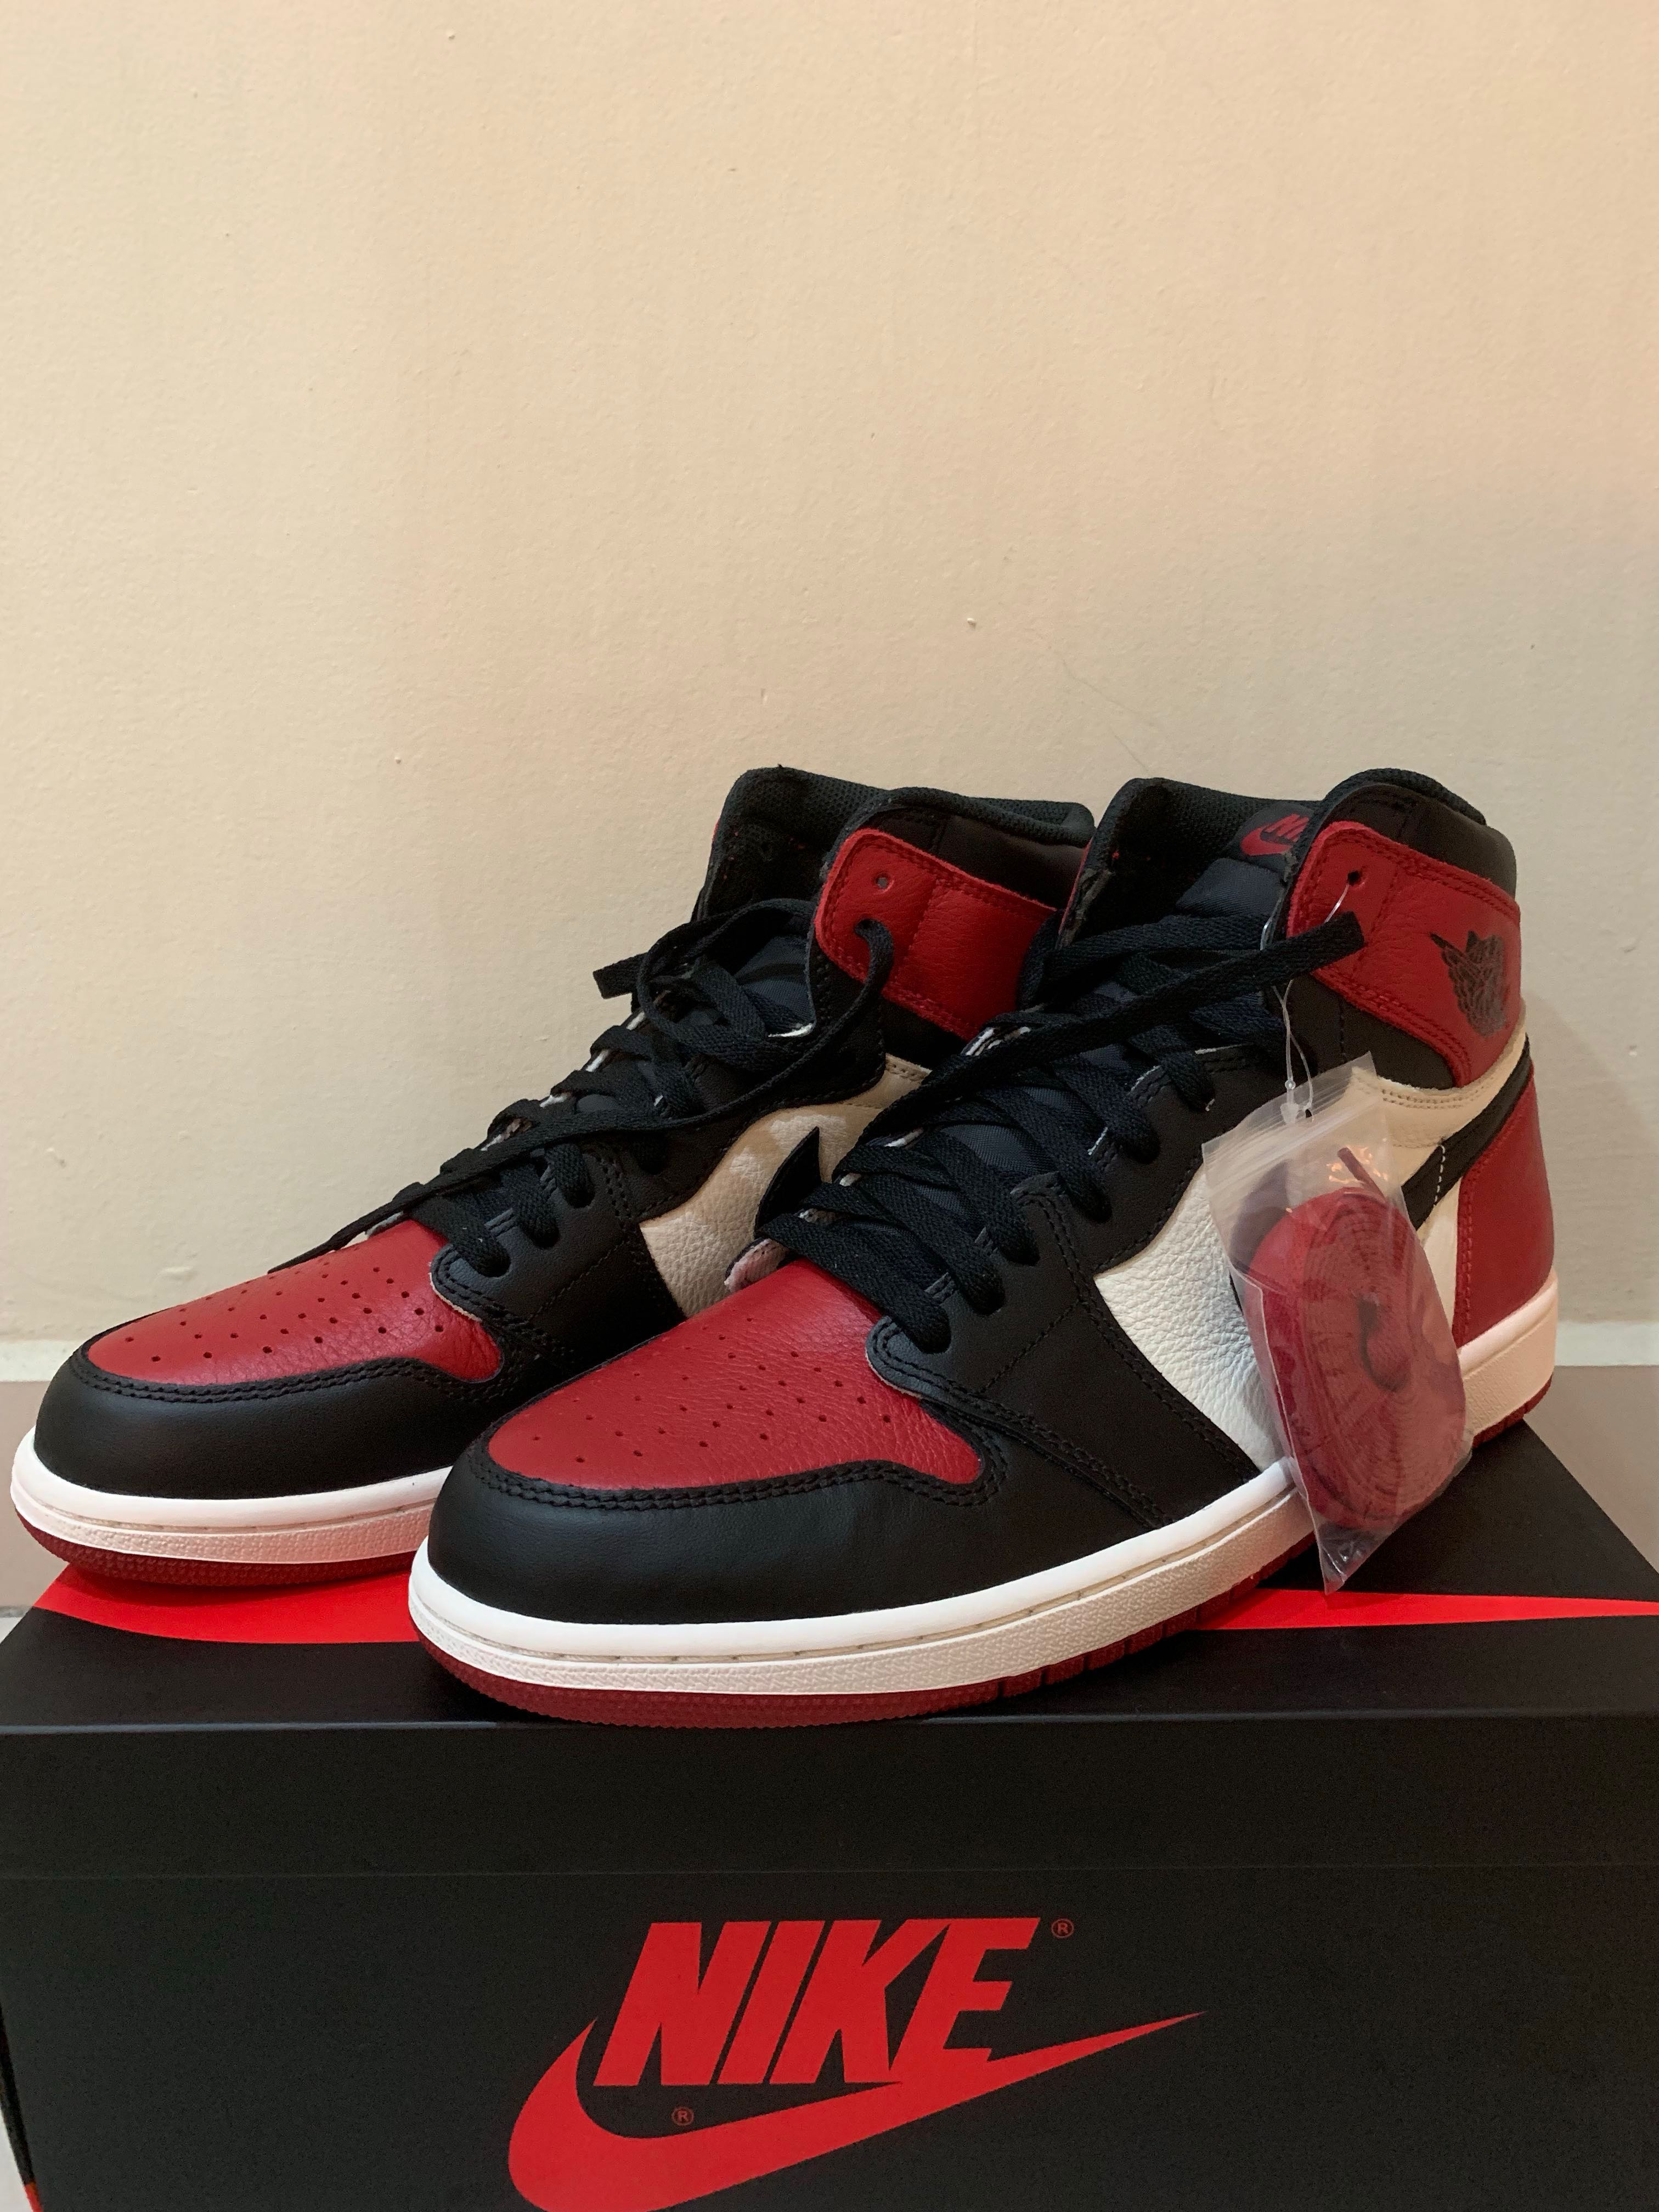 3971396c30aa 2x Air Jordan 1 Bred toe and court purple